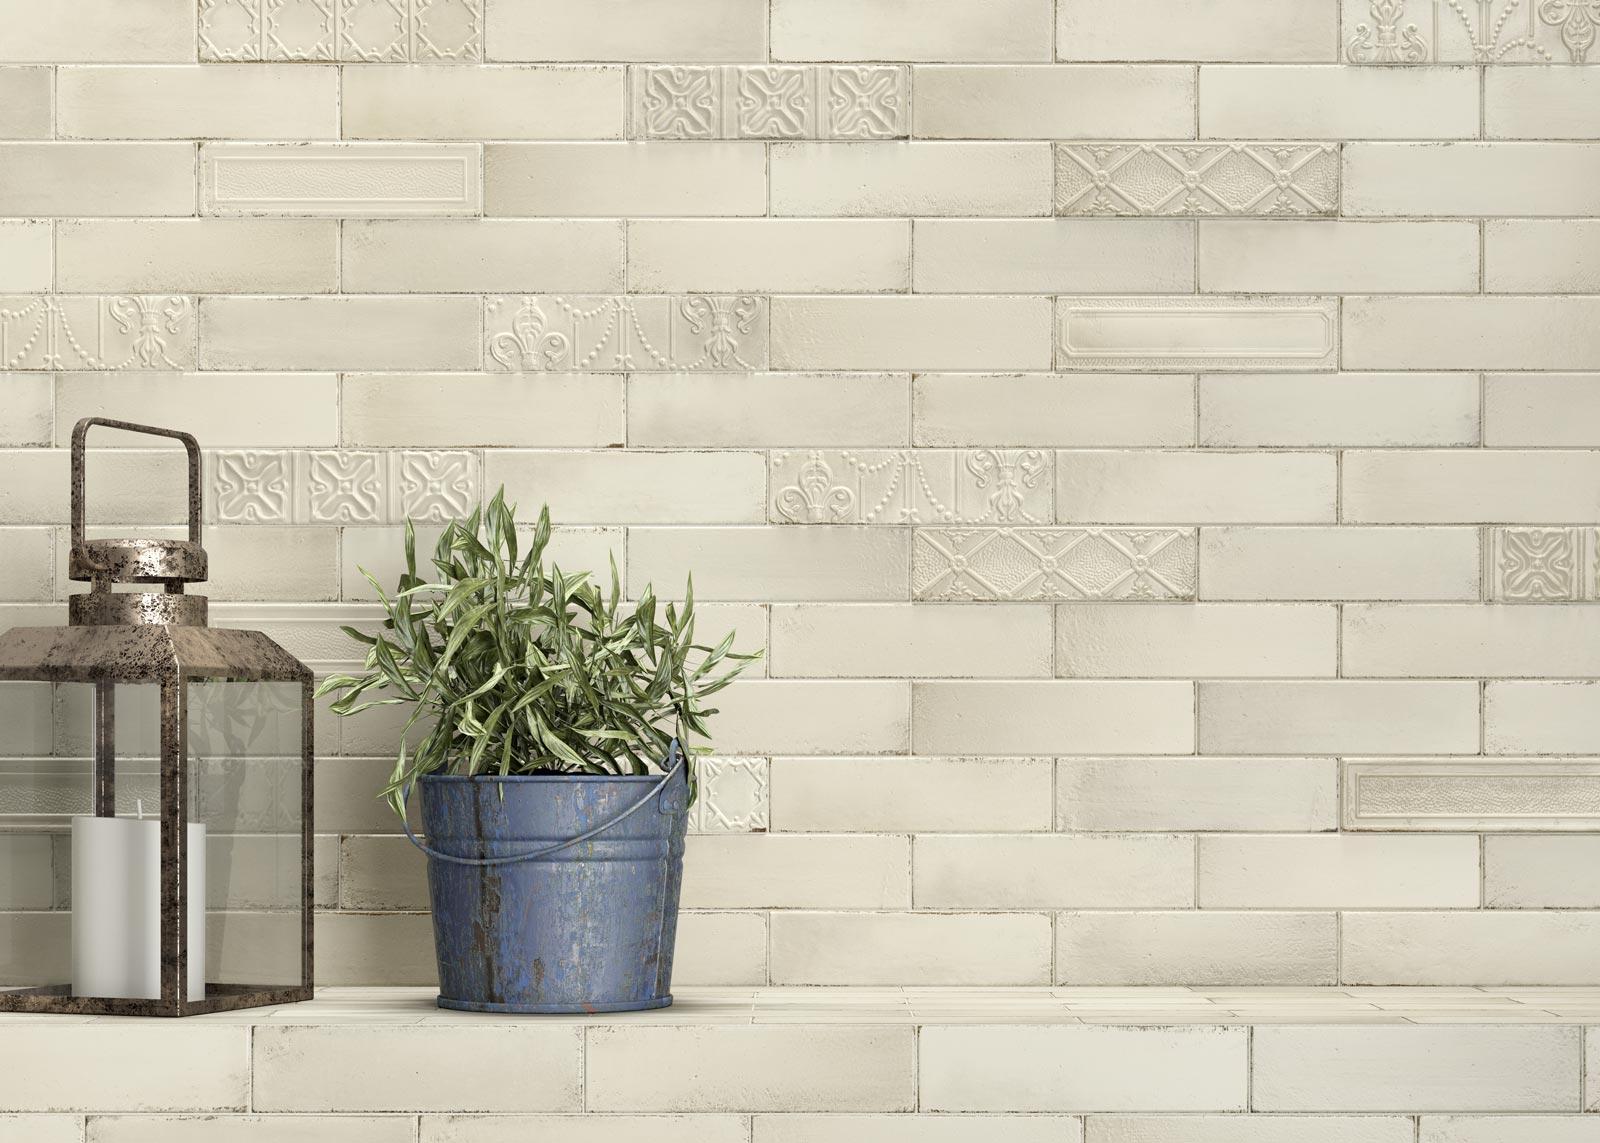 Cool 12X12 Acoustic Ceiling Tiles Huge 12X12 Vinyl Floor Tile Solid 12X24 Ceramic Floor Tile 2 By 2 Ceiling Tiles Old 2X4 Ceiling Tiles Cheap Black2X4 Subway Tile Backsplash Eden Collection: Majolica Effect Tiles | Ragno